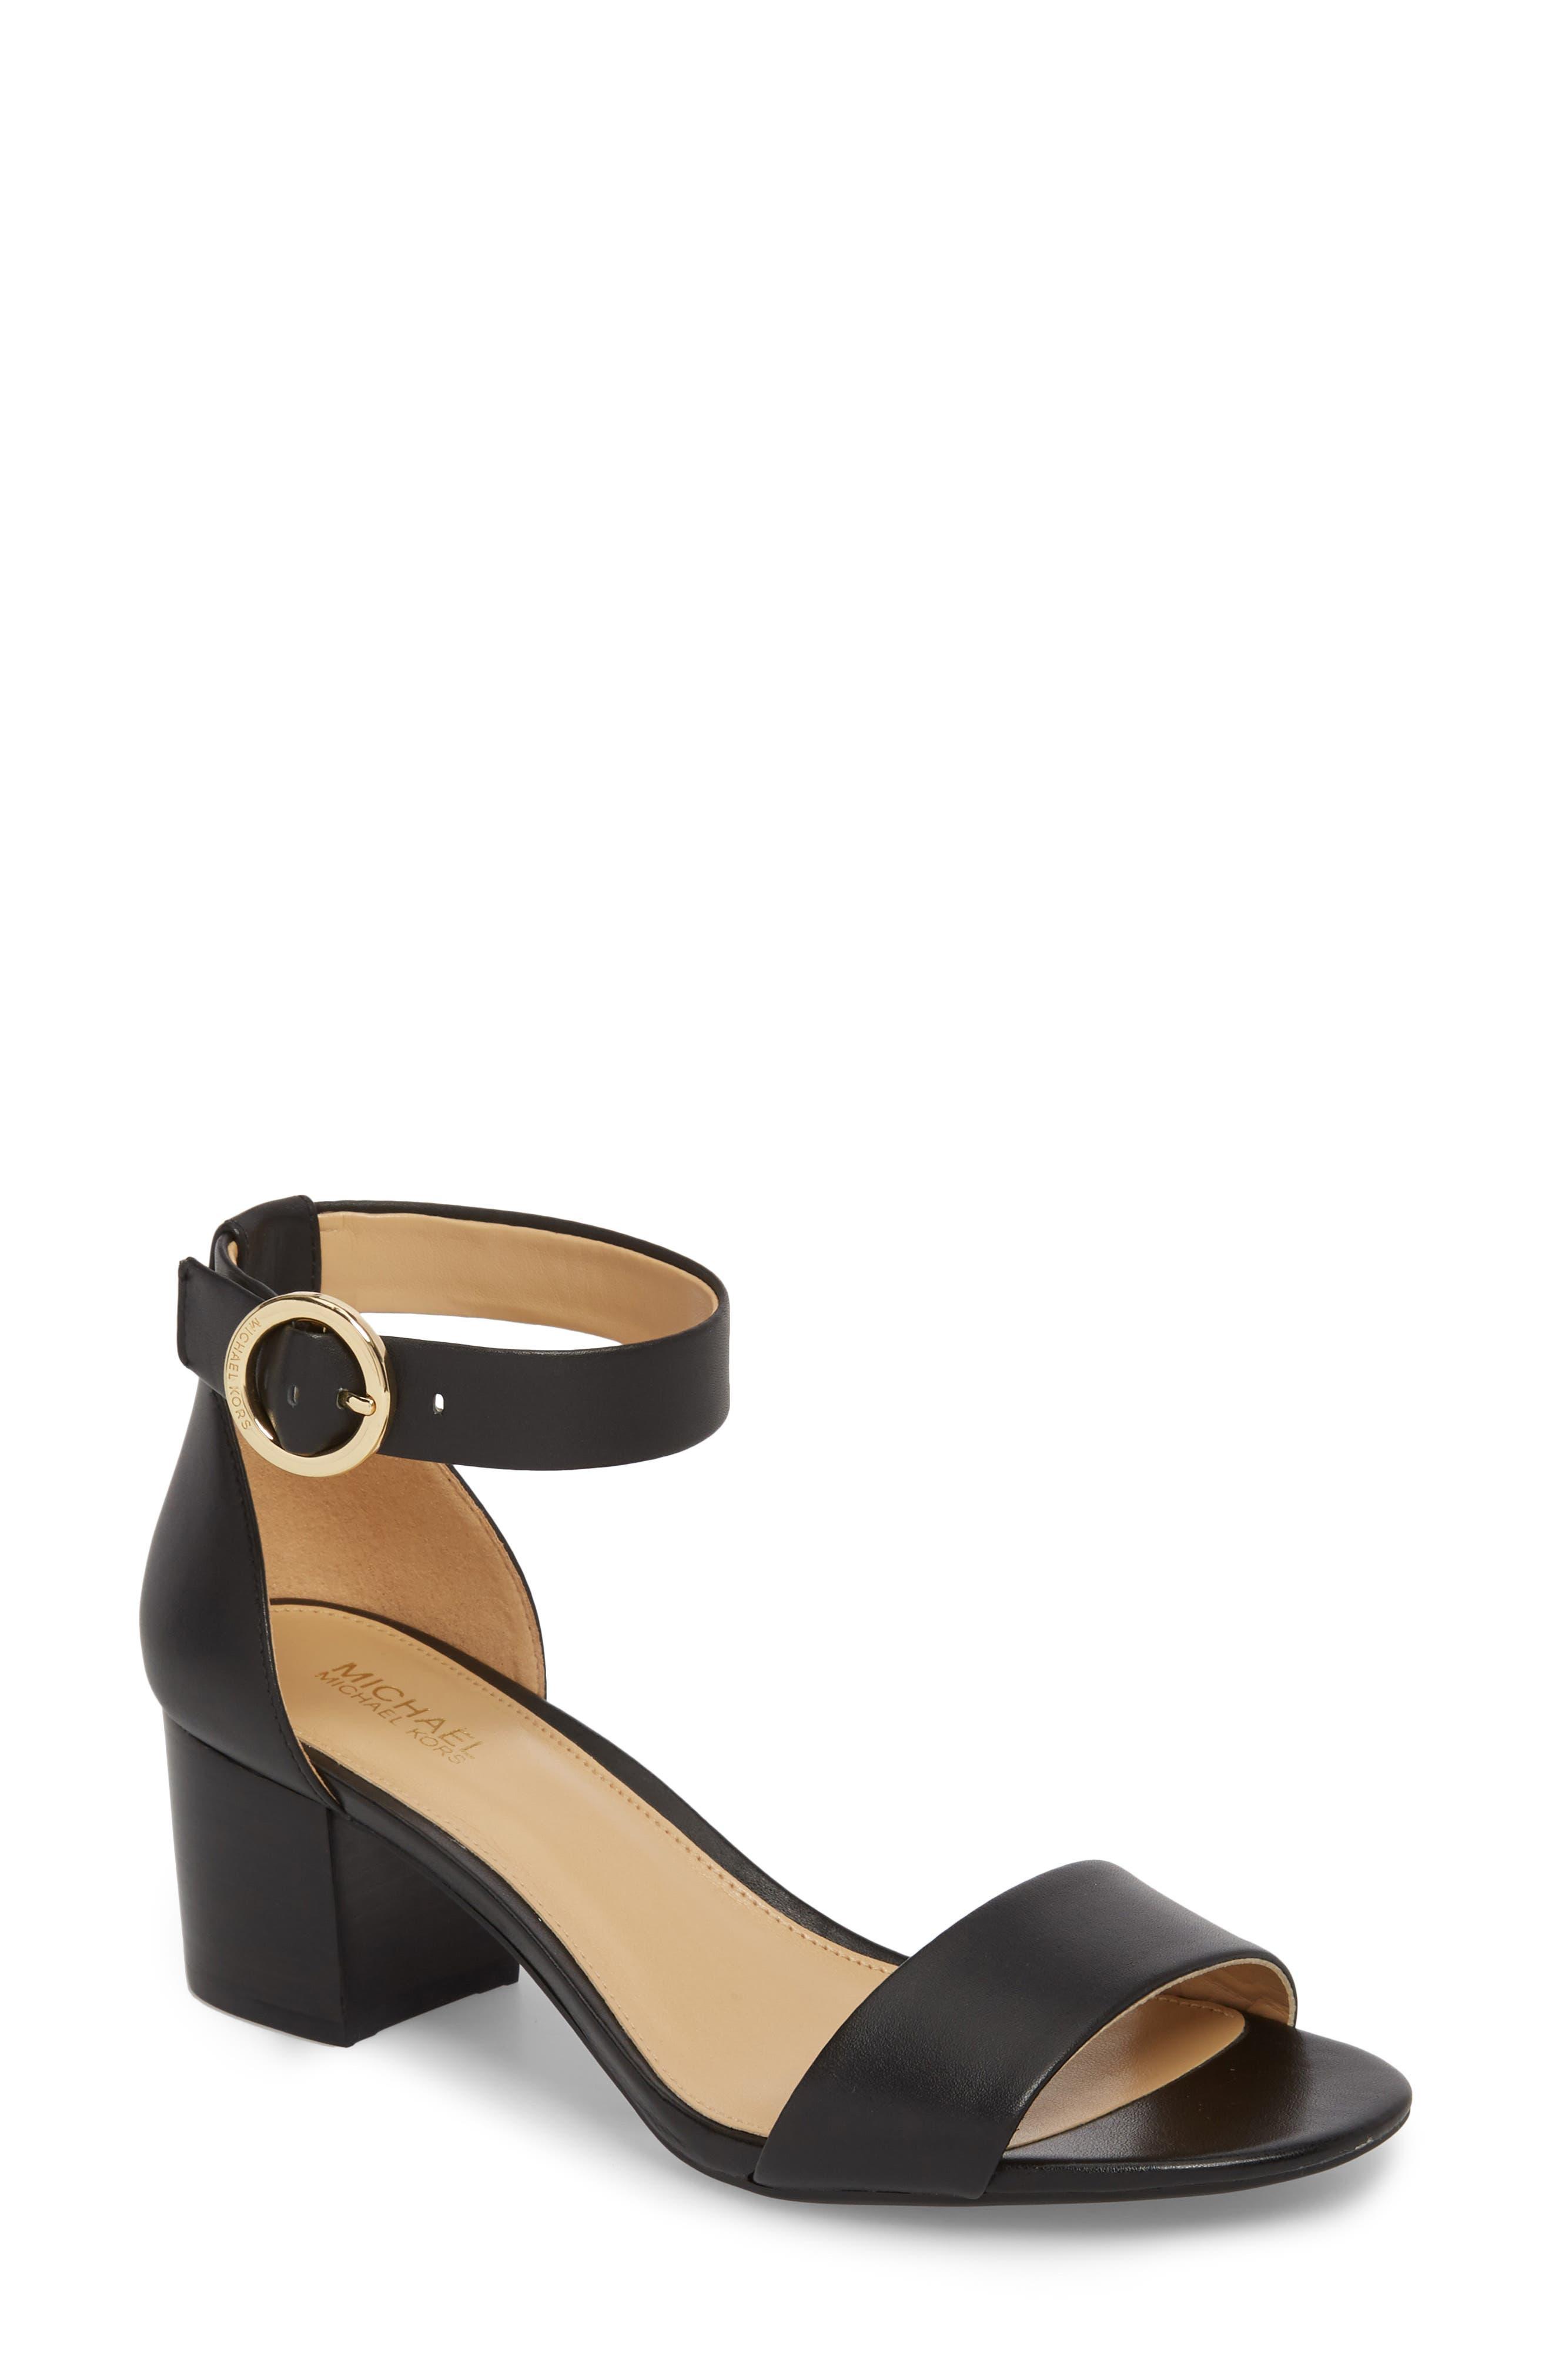 Lena Block Heel Sandal,                             Main thumbnail 1, color,                             BLACK